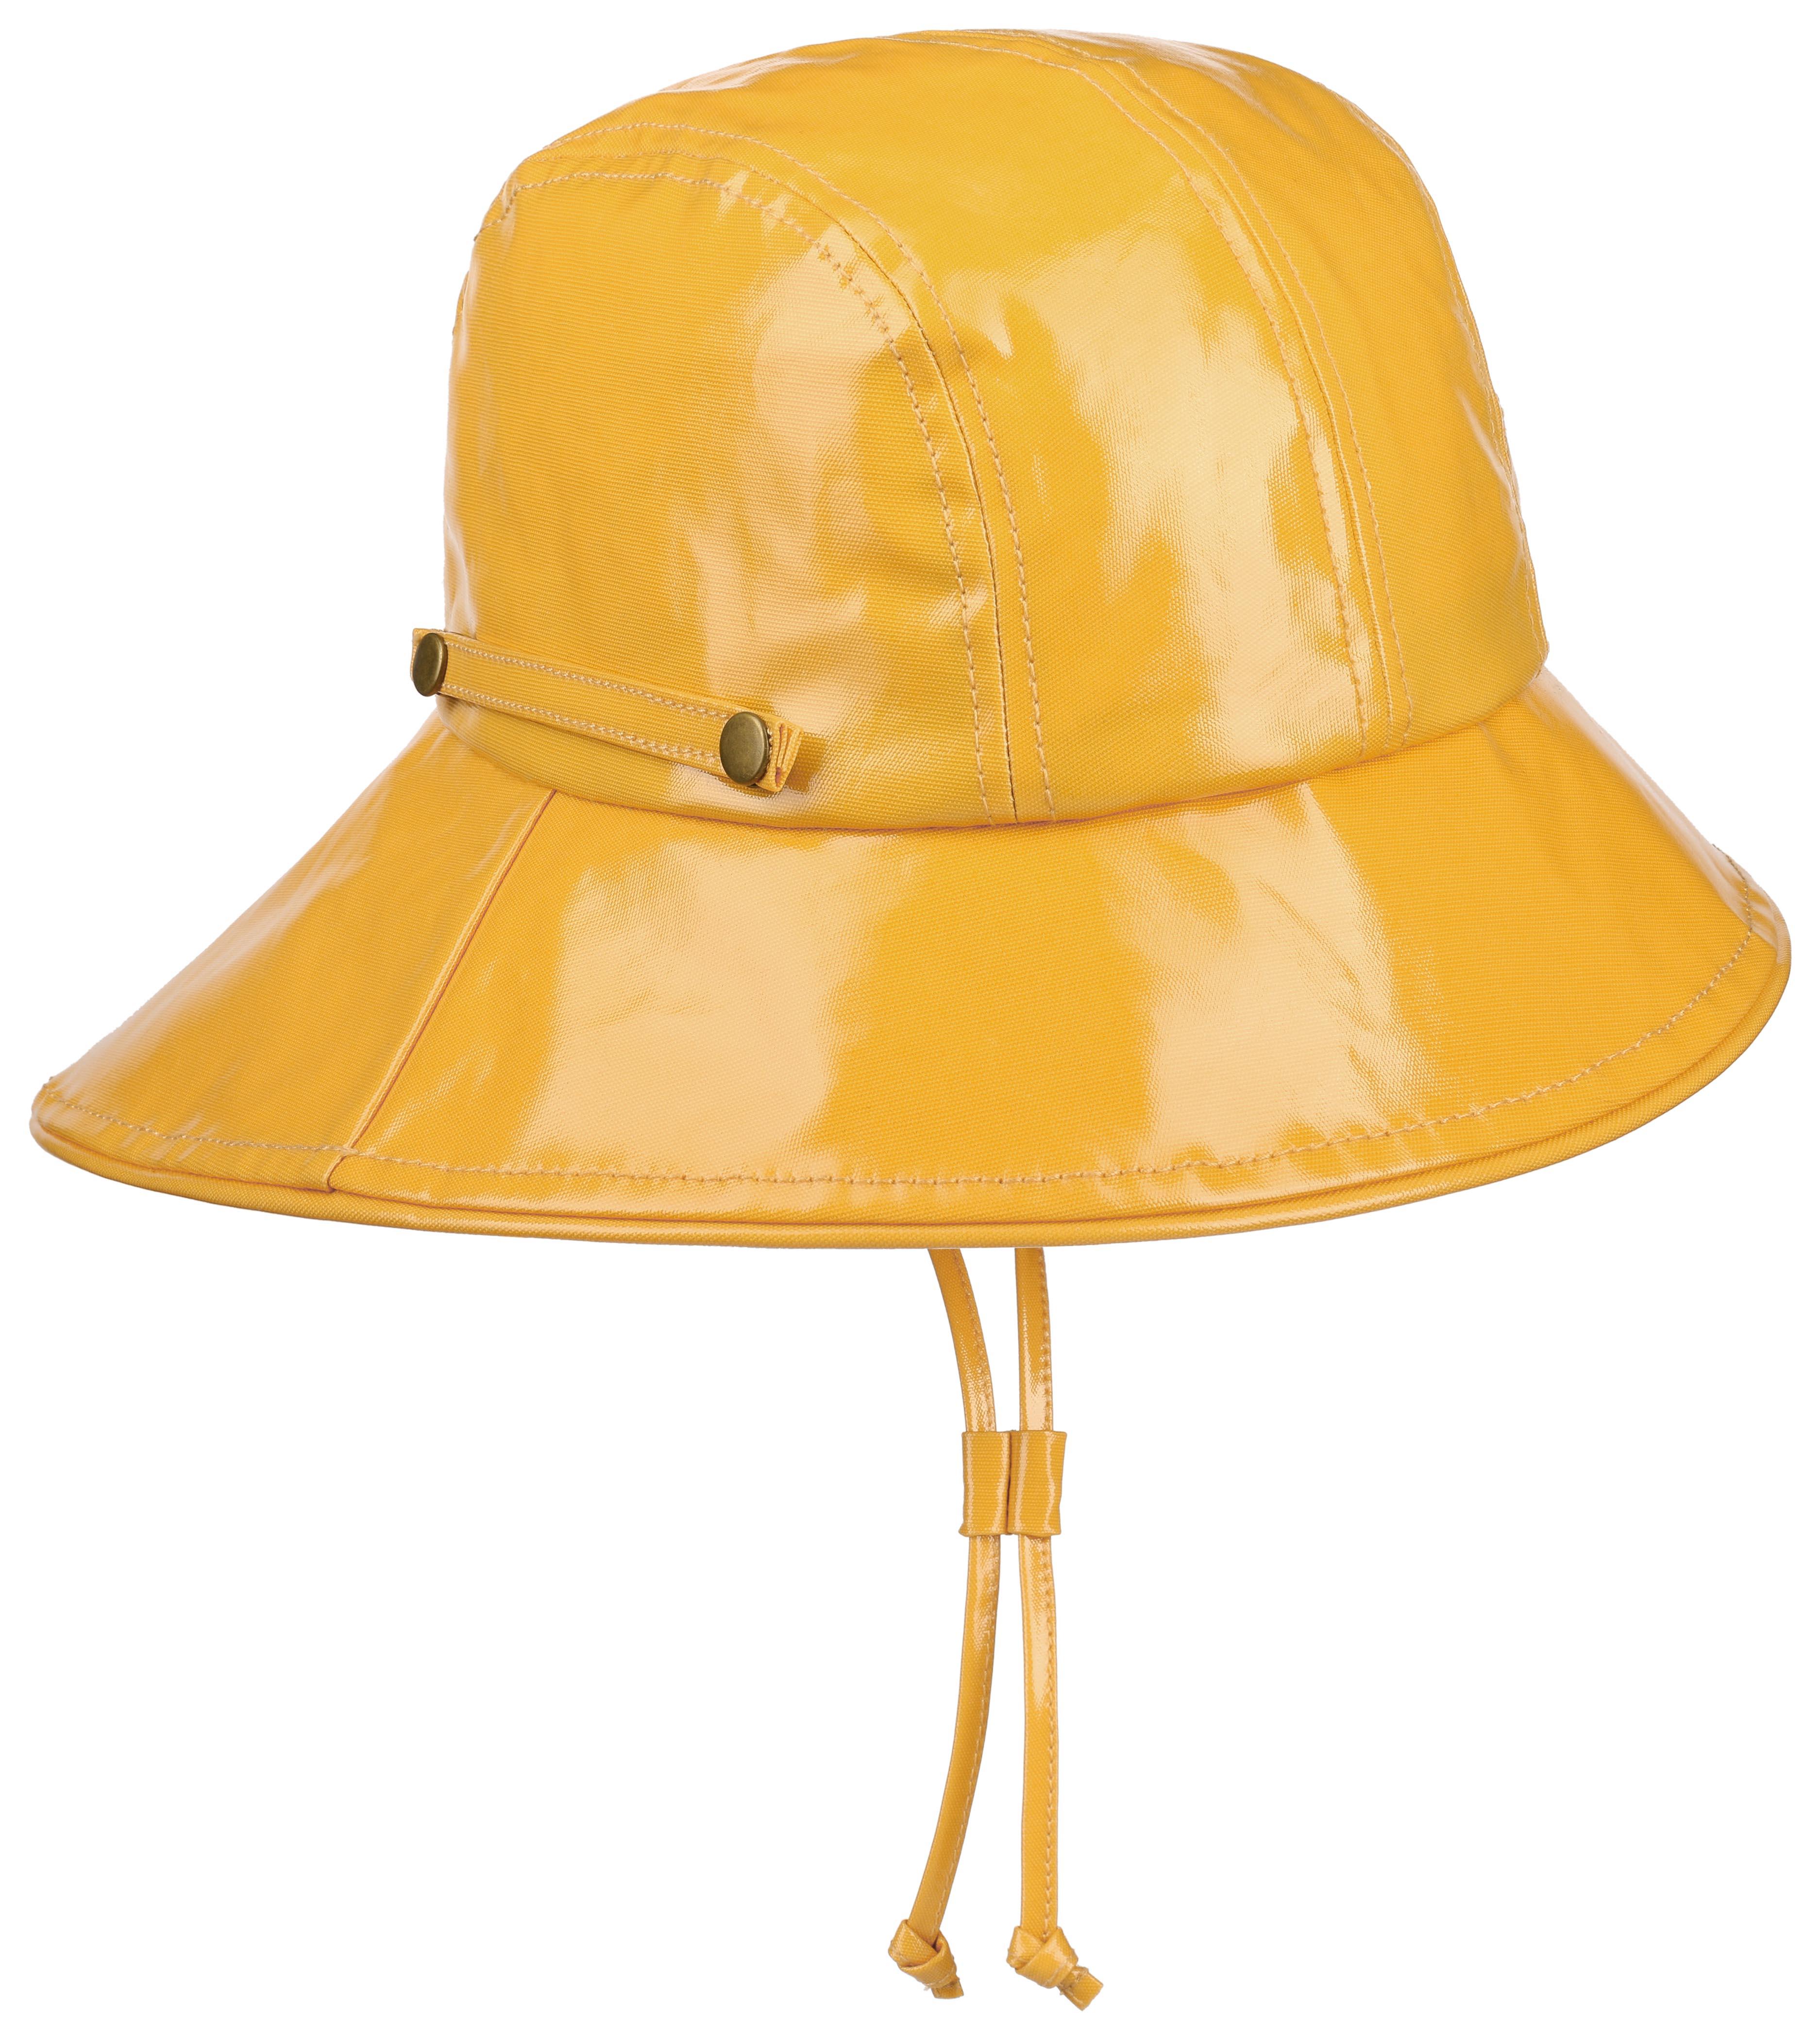 Stetson Souwester Hammaburg Rain Hat